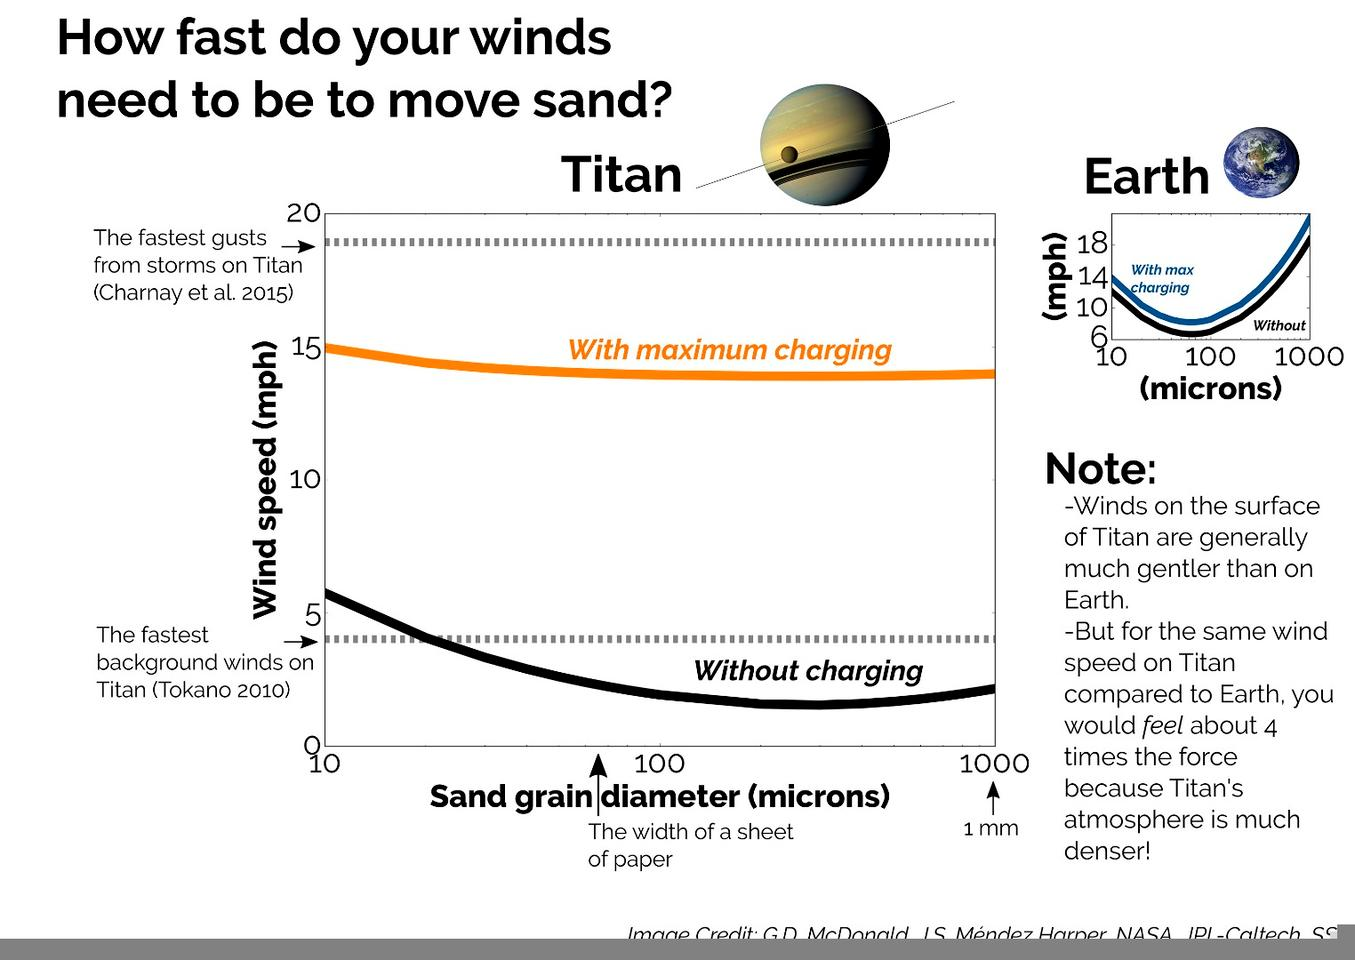 Description of the Titan winds